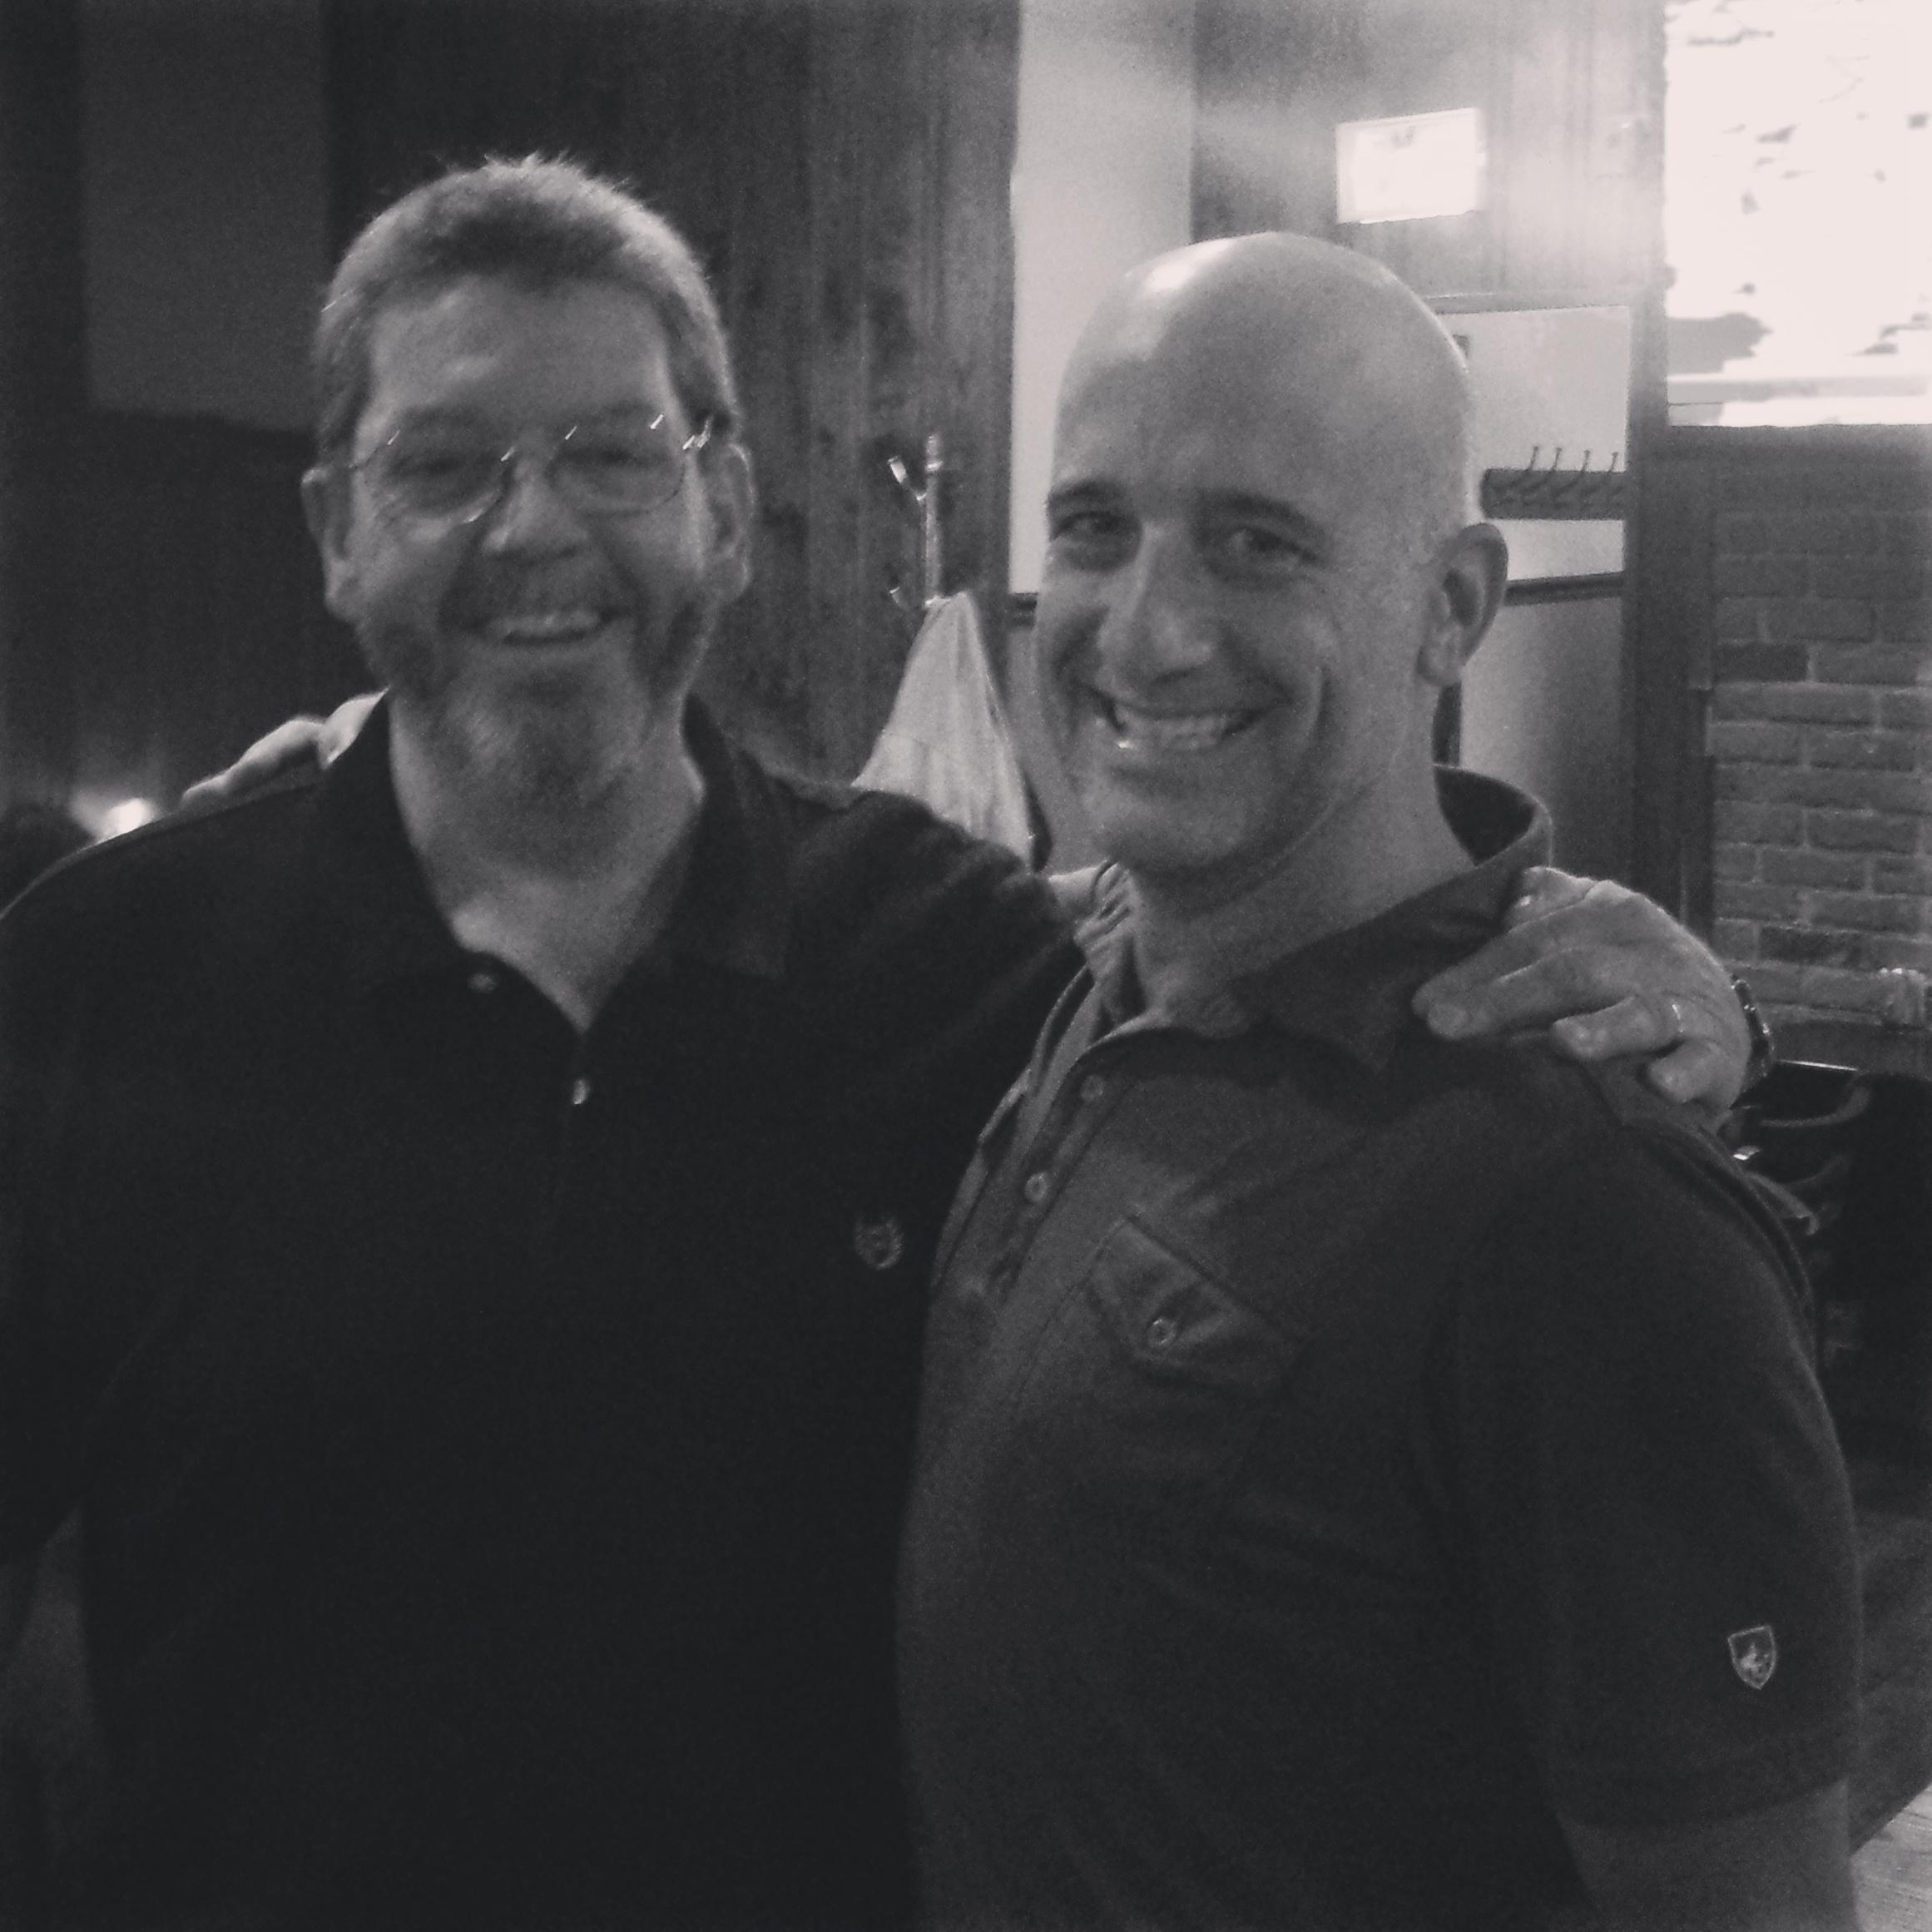 My old bartender, Jim at Gillanes